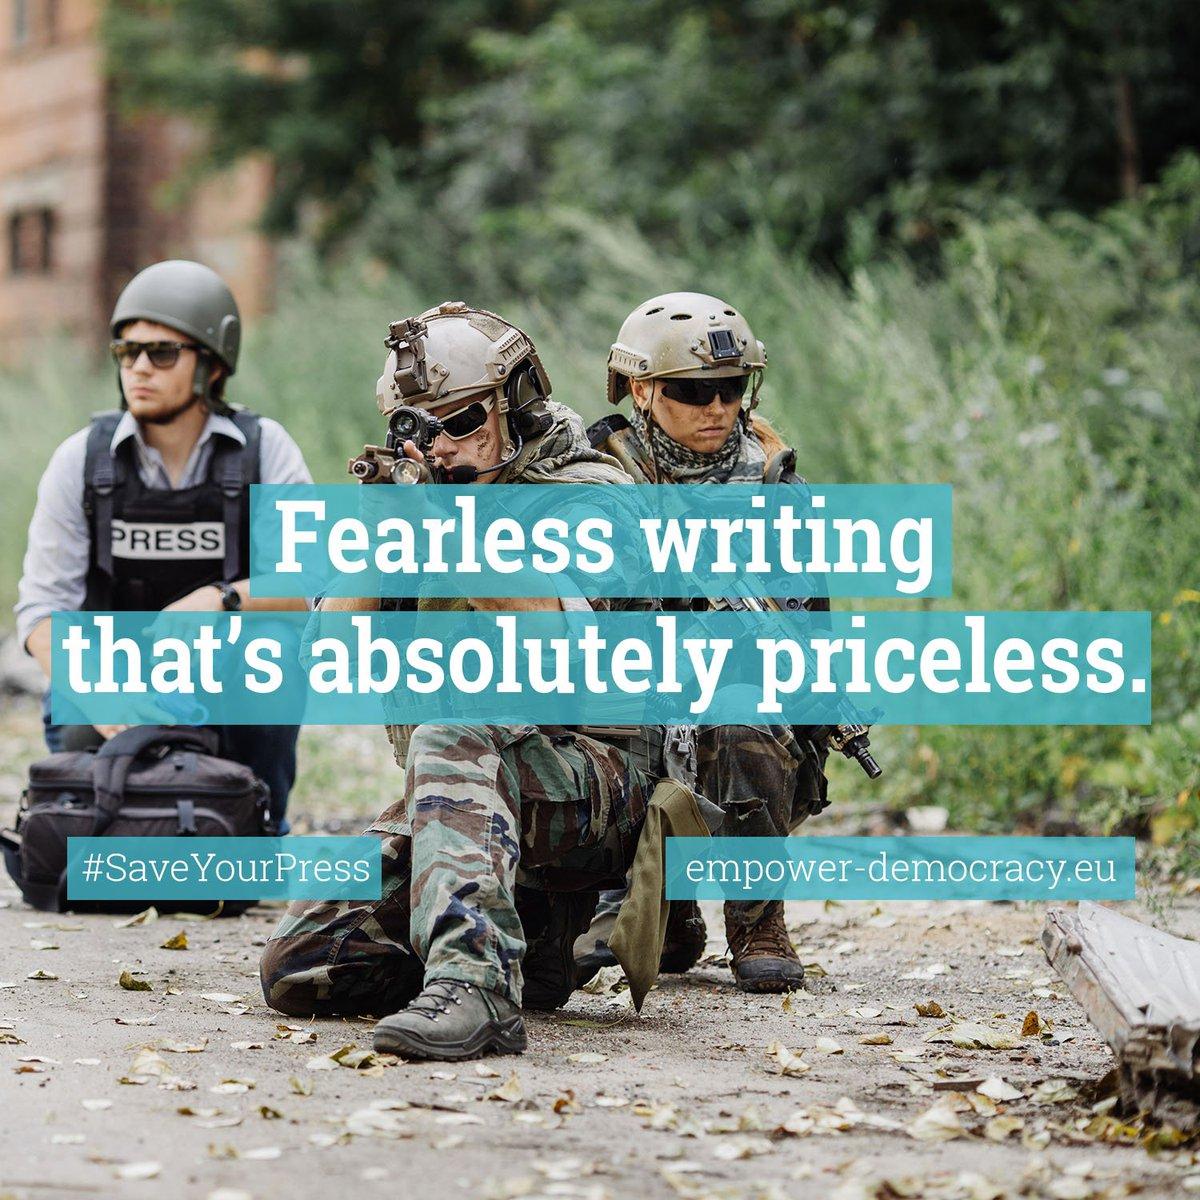 High quality reporting is a tough job #SaveYourPress #copyright  http://www. empower-democracy.eu  &nbsp;   @TonoEPP @fulviomartuscie<br>http://pic.twitter.com/N2ohOvTO0E